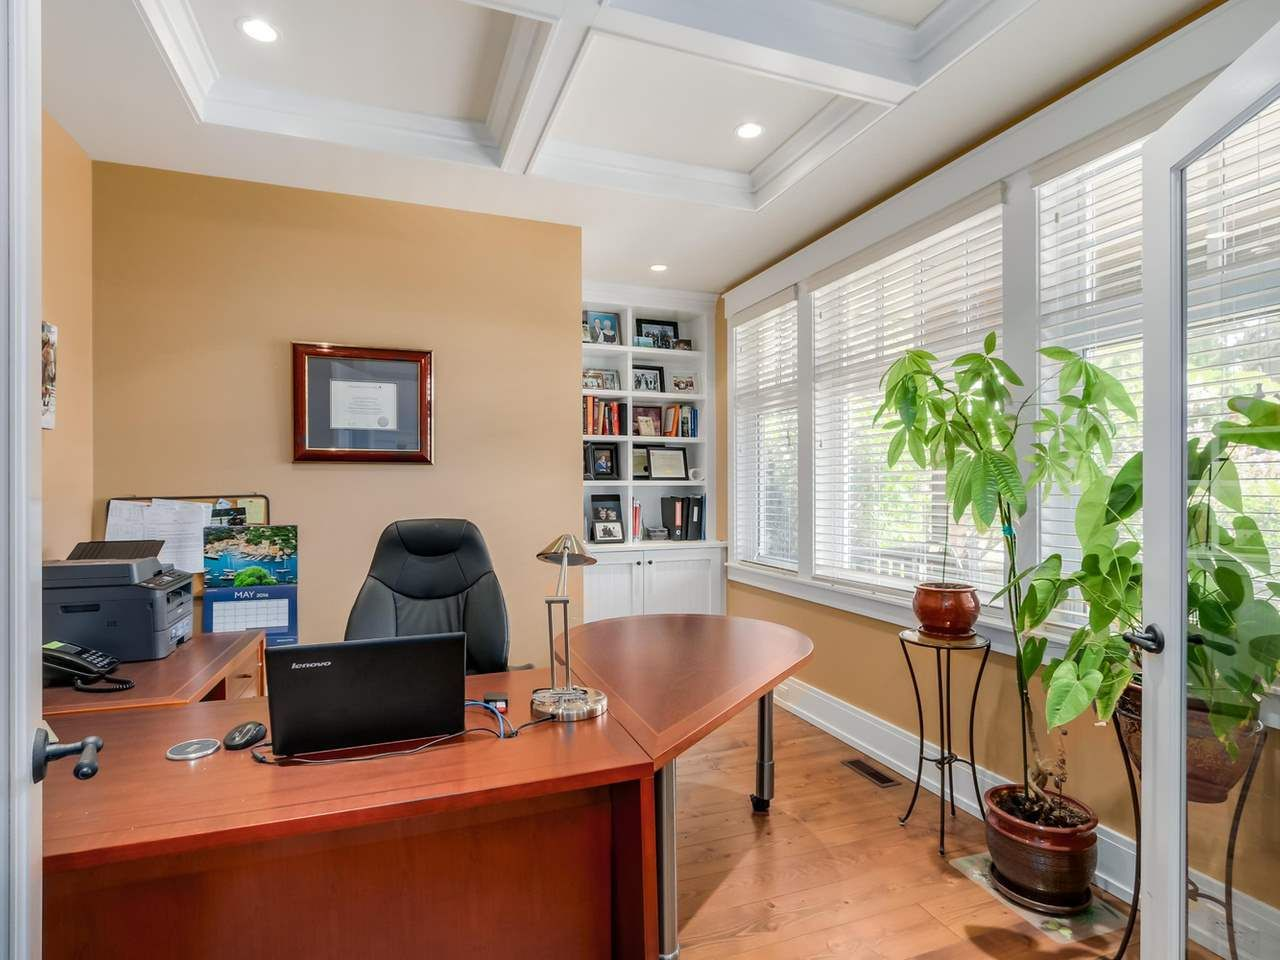 Photo 9: Photos: 13029 14 Avenue in Surrey: Crescent Bch Ocean Pk. House for sale (South Surrey White Rock)  : MLS®# R2070160